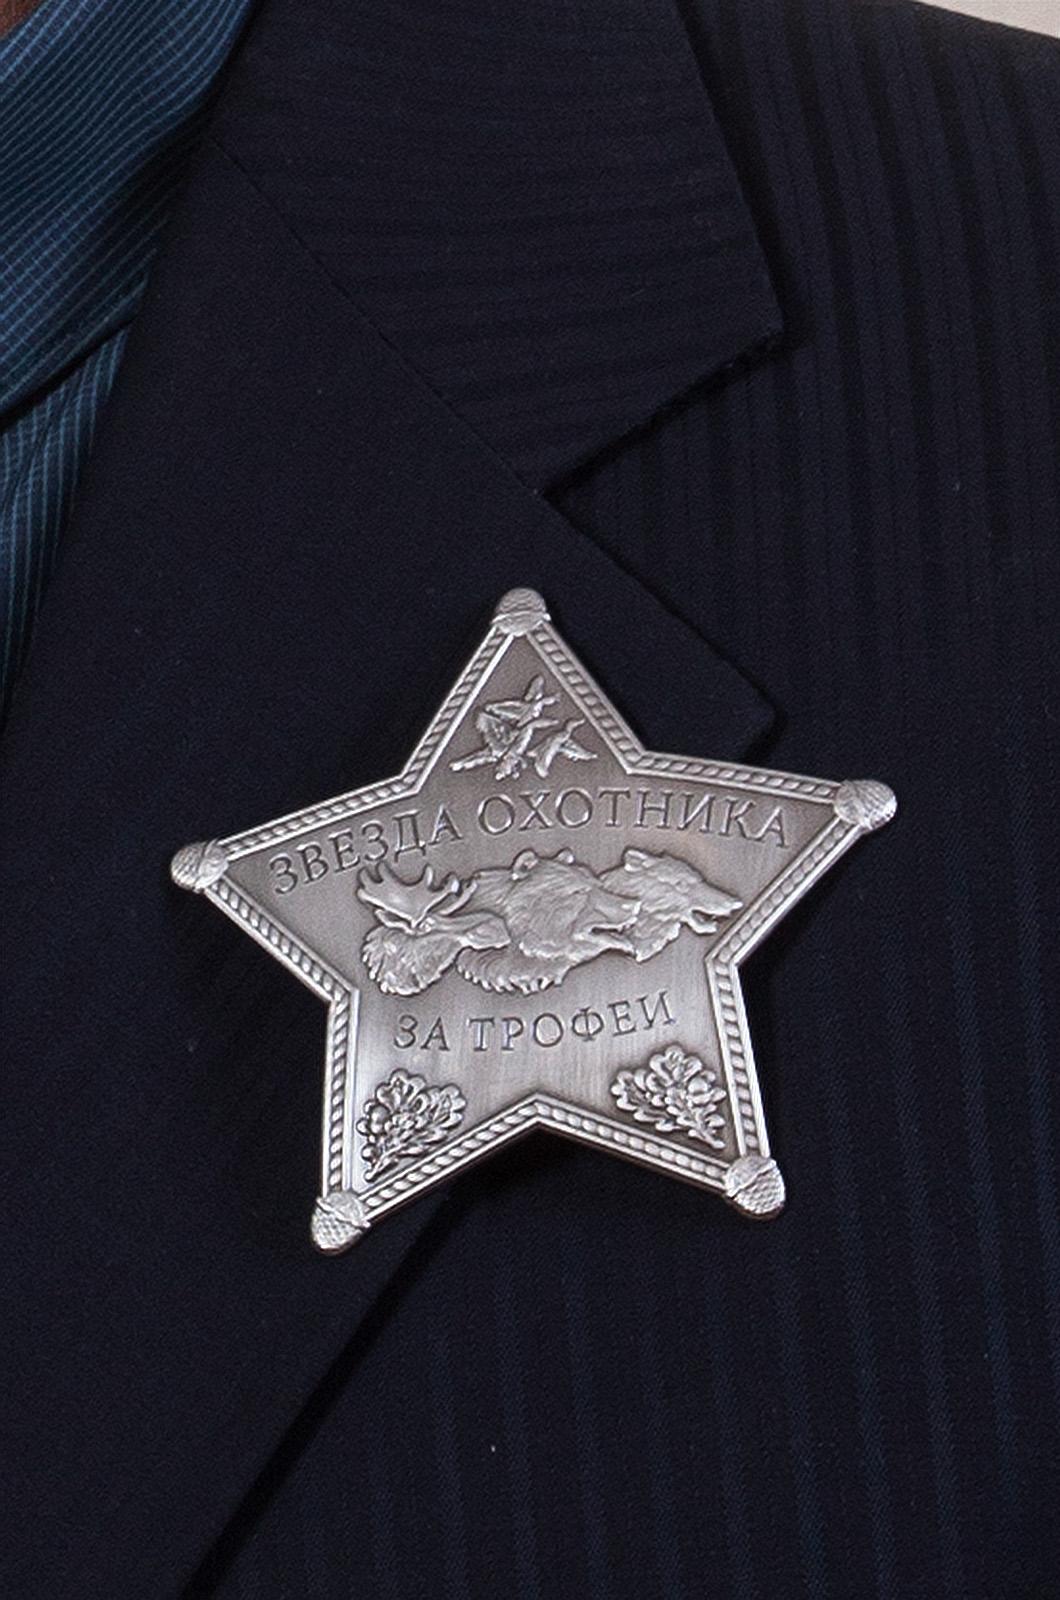 "Звезда охотника ""За трофеи"" в подарок"